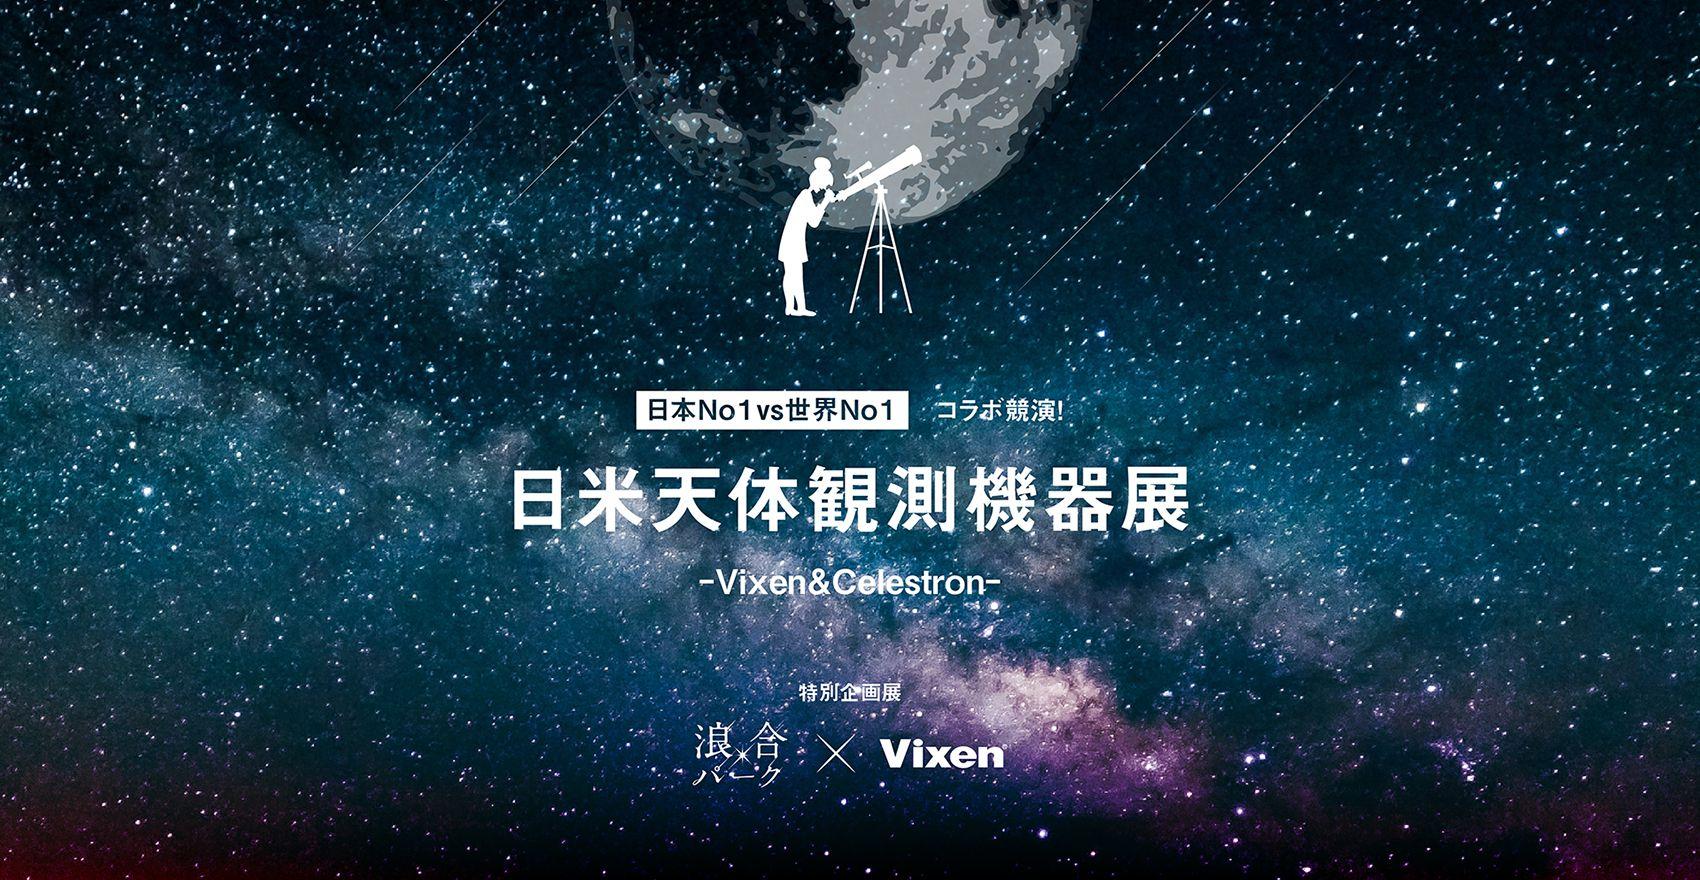 浪合パーク×Vixen 特別企画展【日本No1vs世界No1】コラボ競演!日米天体観測機器展-Vixen&Celestron-